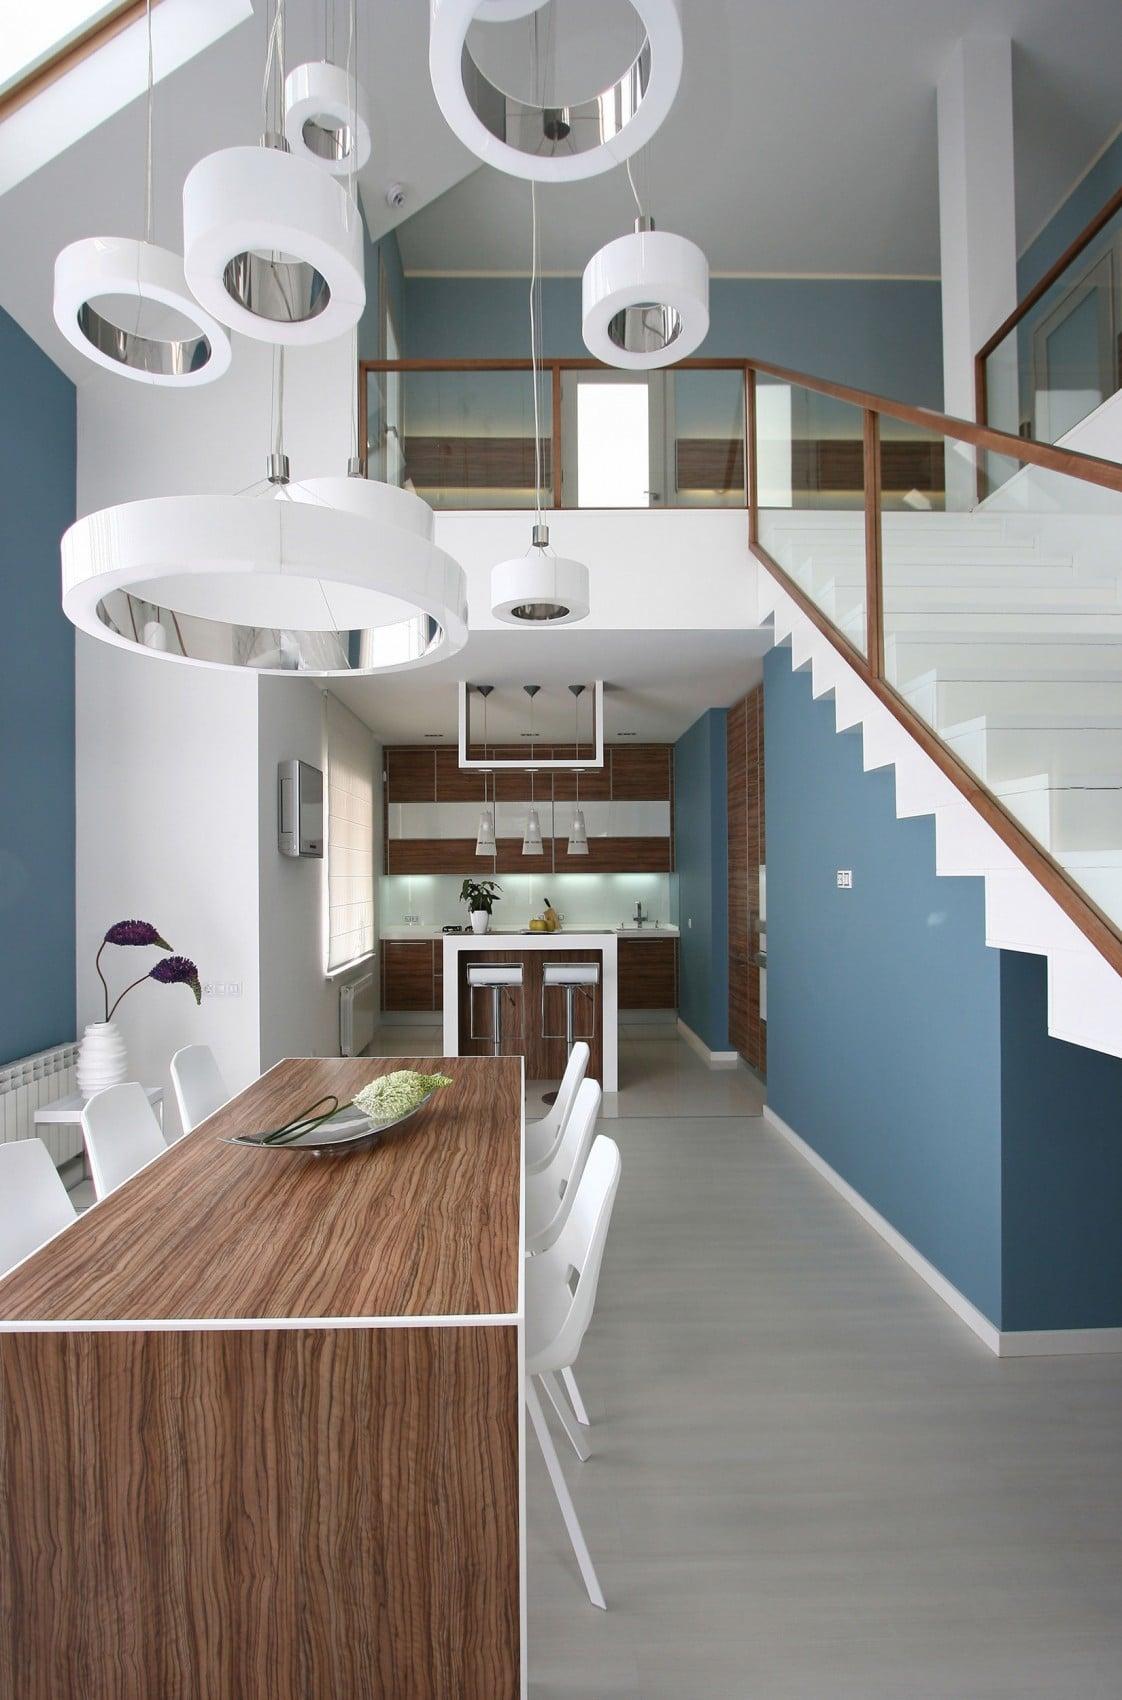 Dise o casa moderna dos plantas y planos construye hogar for Casa minimalista interior cocina